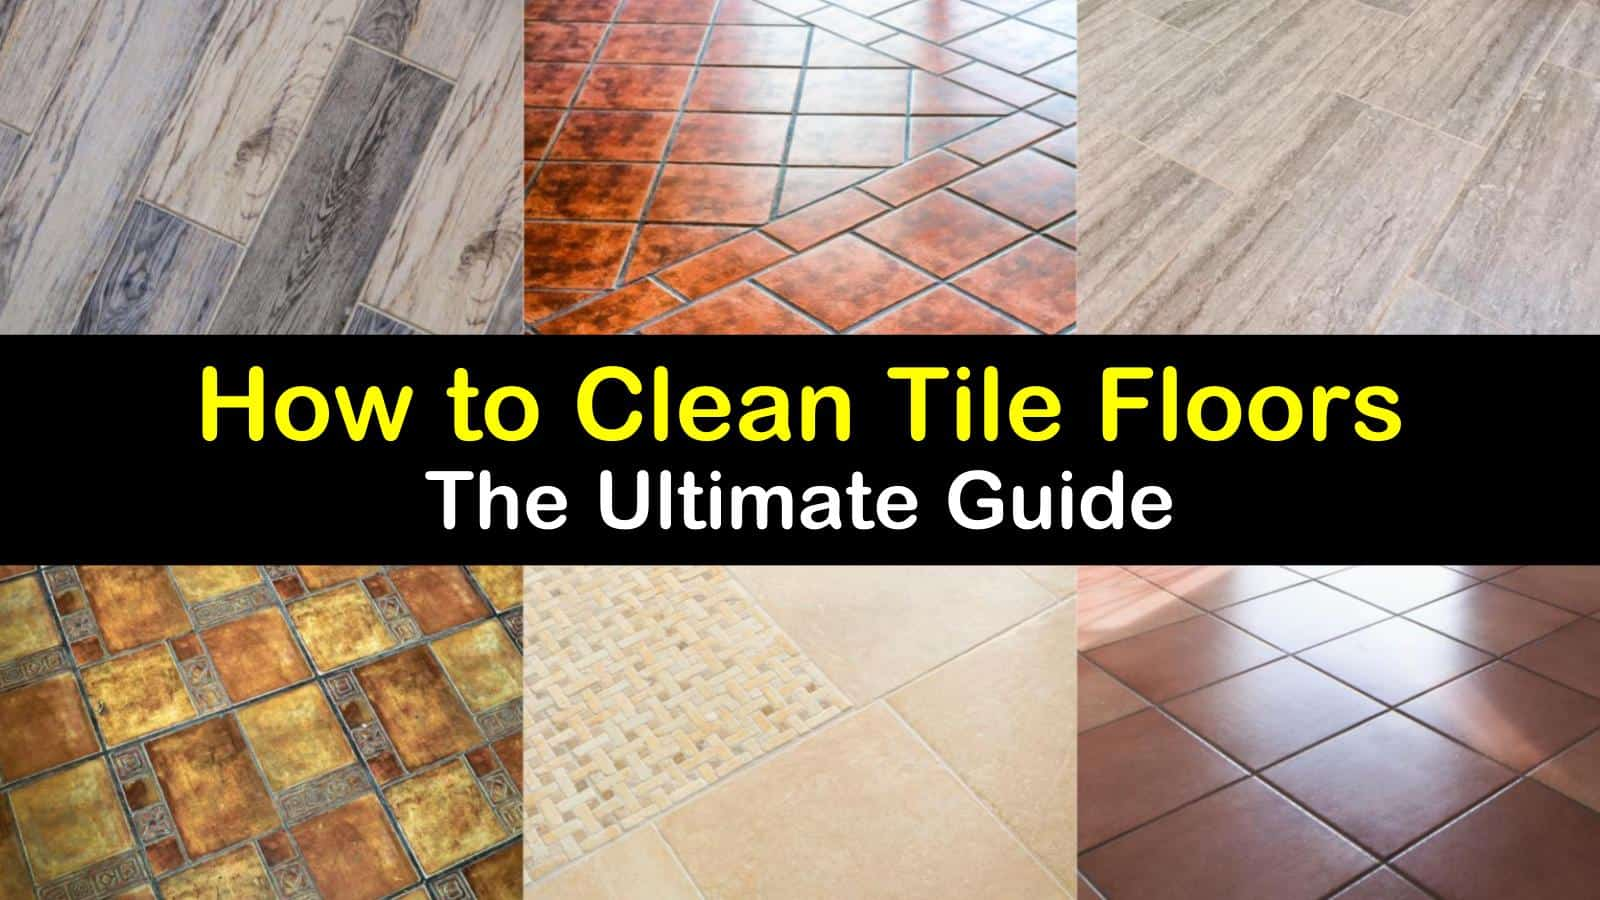 how to clean tile floors titleimg1